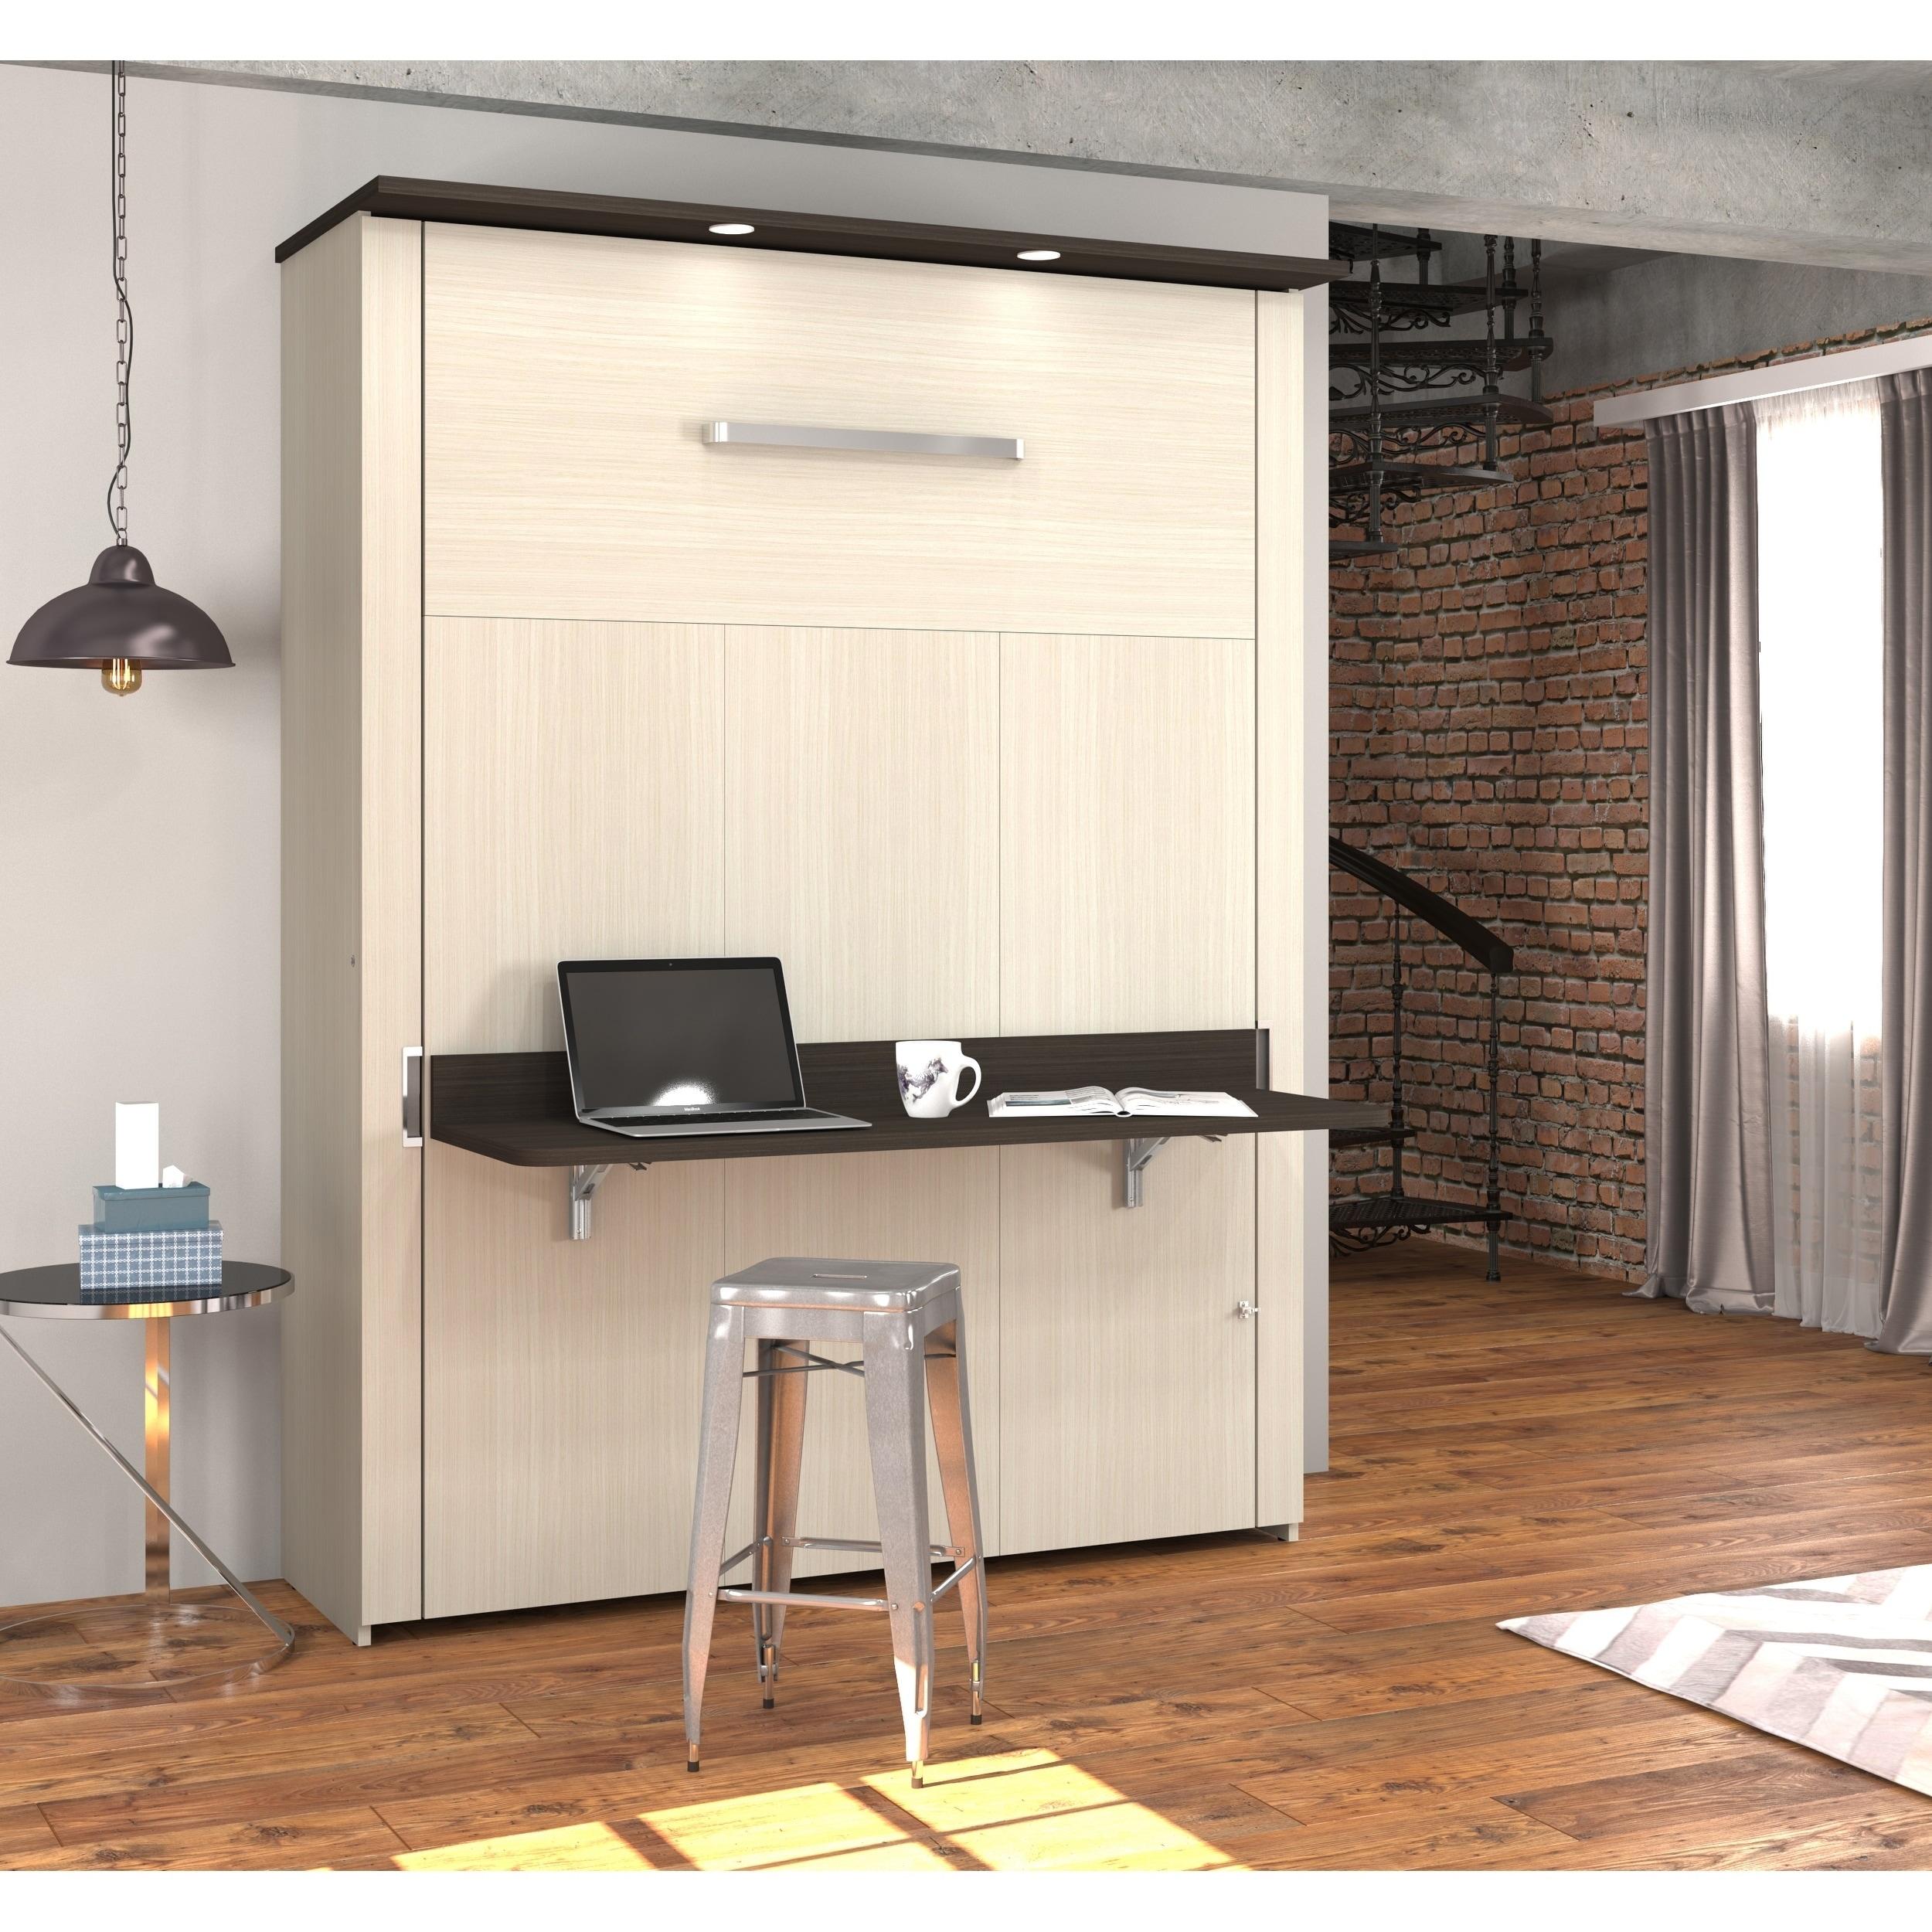 Bestar Lumina Queen Wall Bed With Desk In White Chocolate Dark